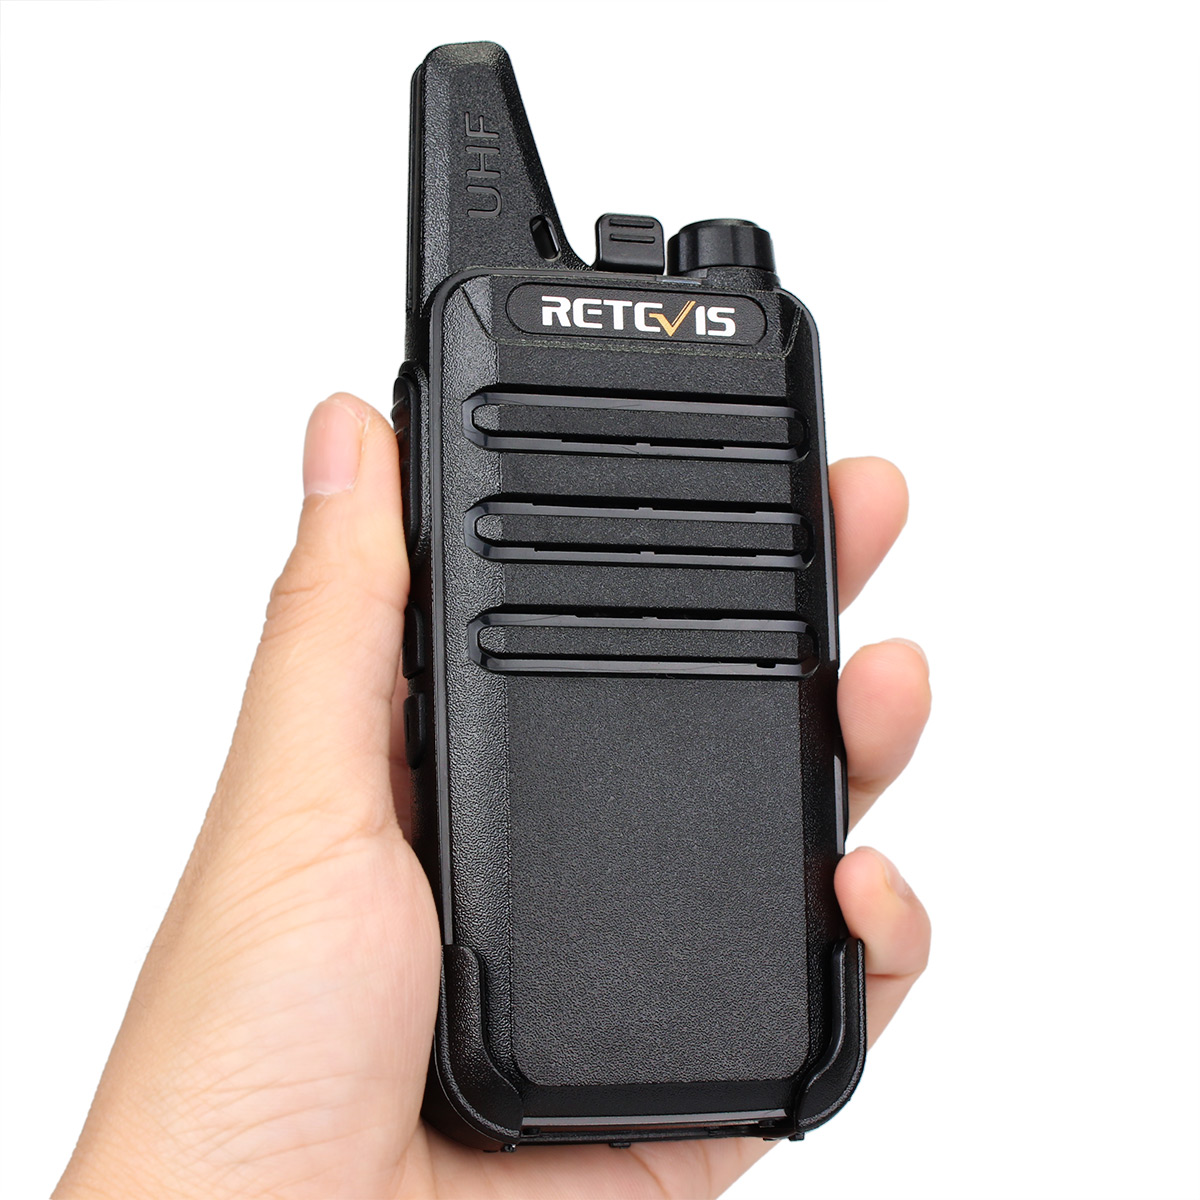 10xRetevis RT22 Walkie Talkie 2W UHF CTCSS/&DCS 16CH VOX TOT Scan 2-Way Radio US